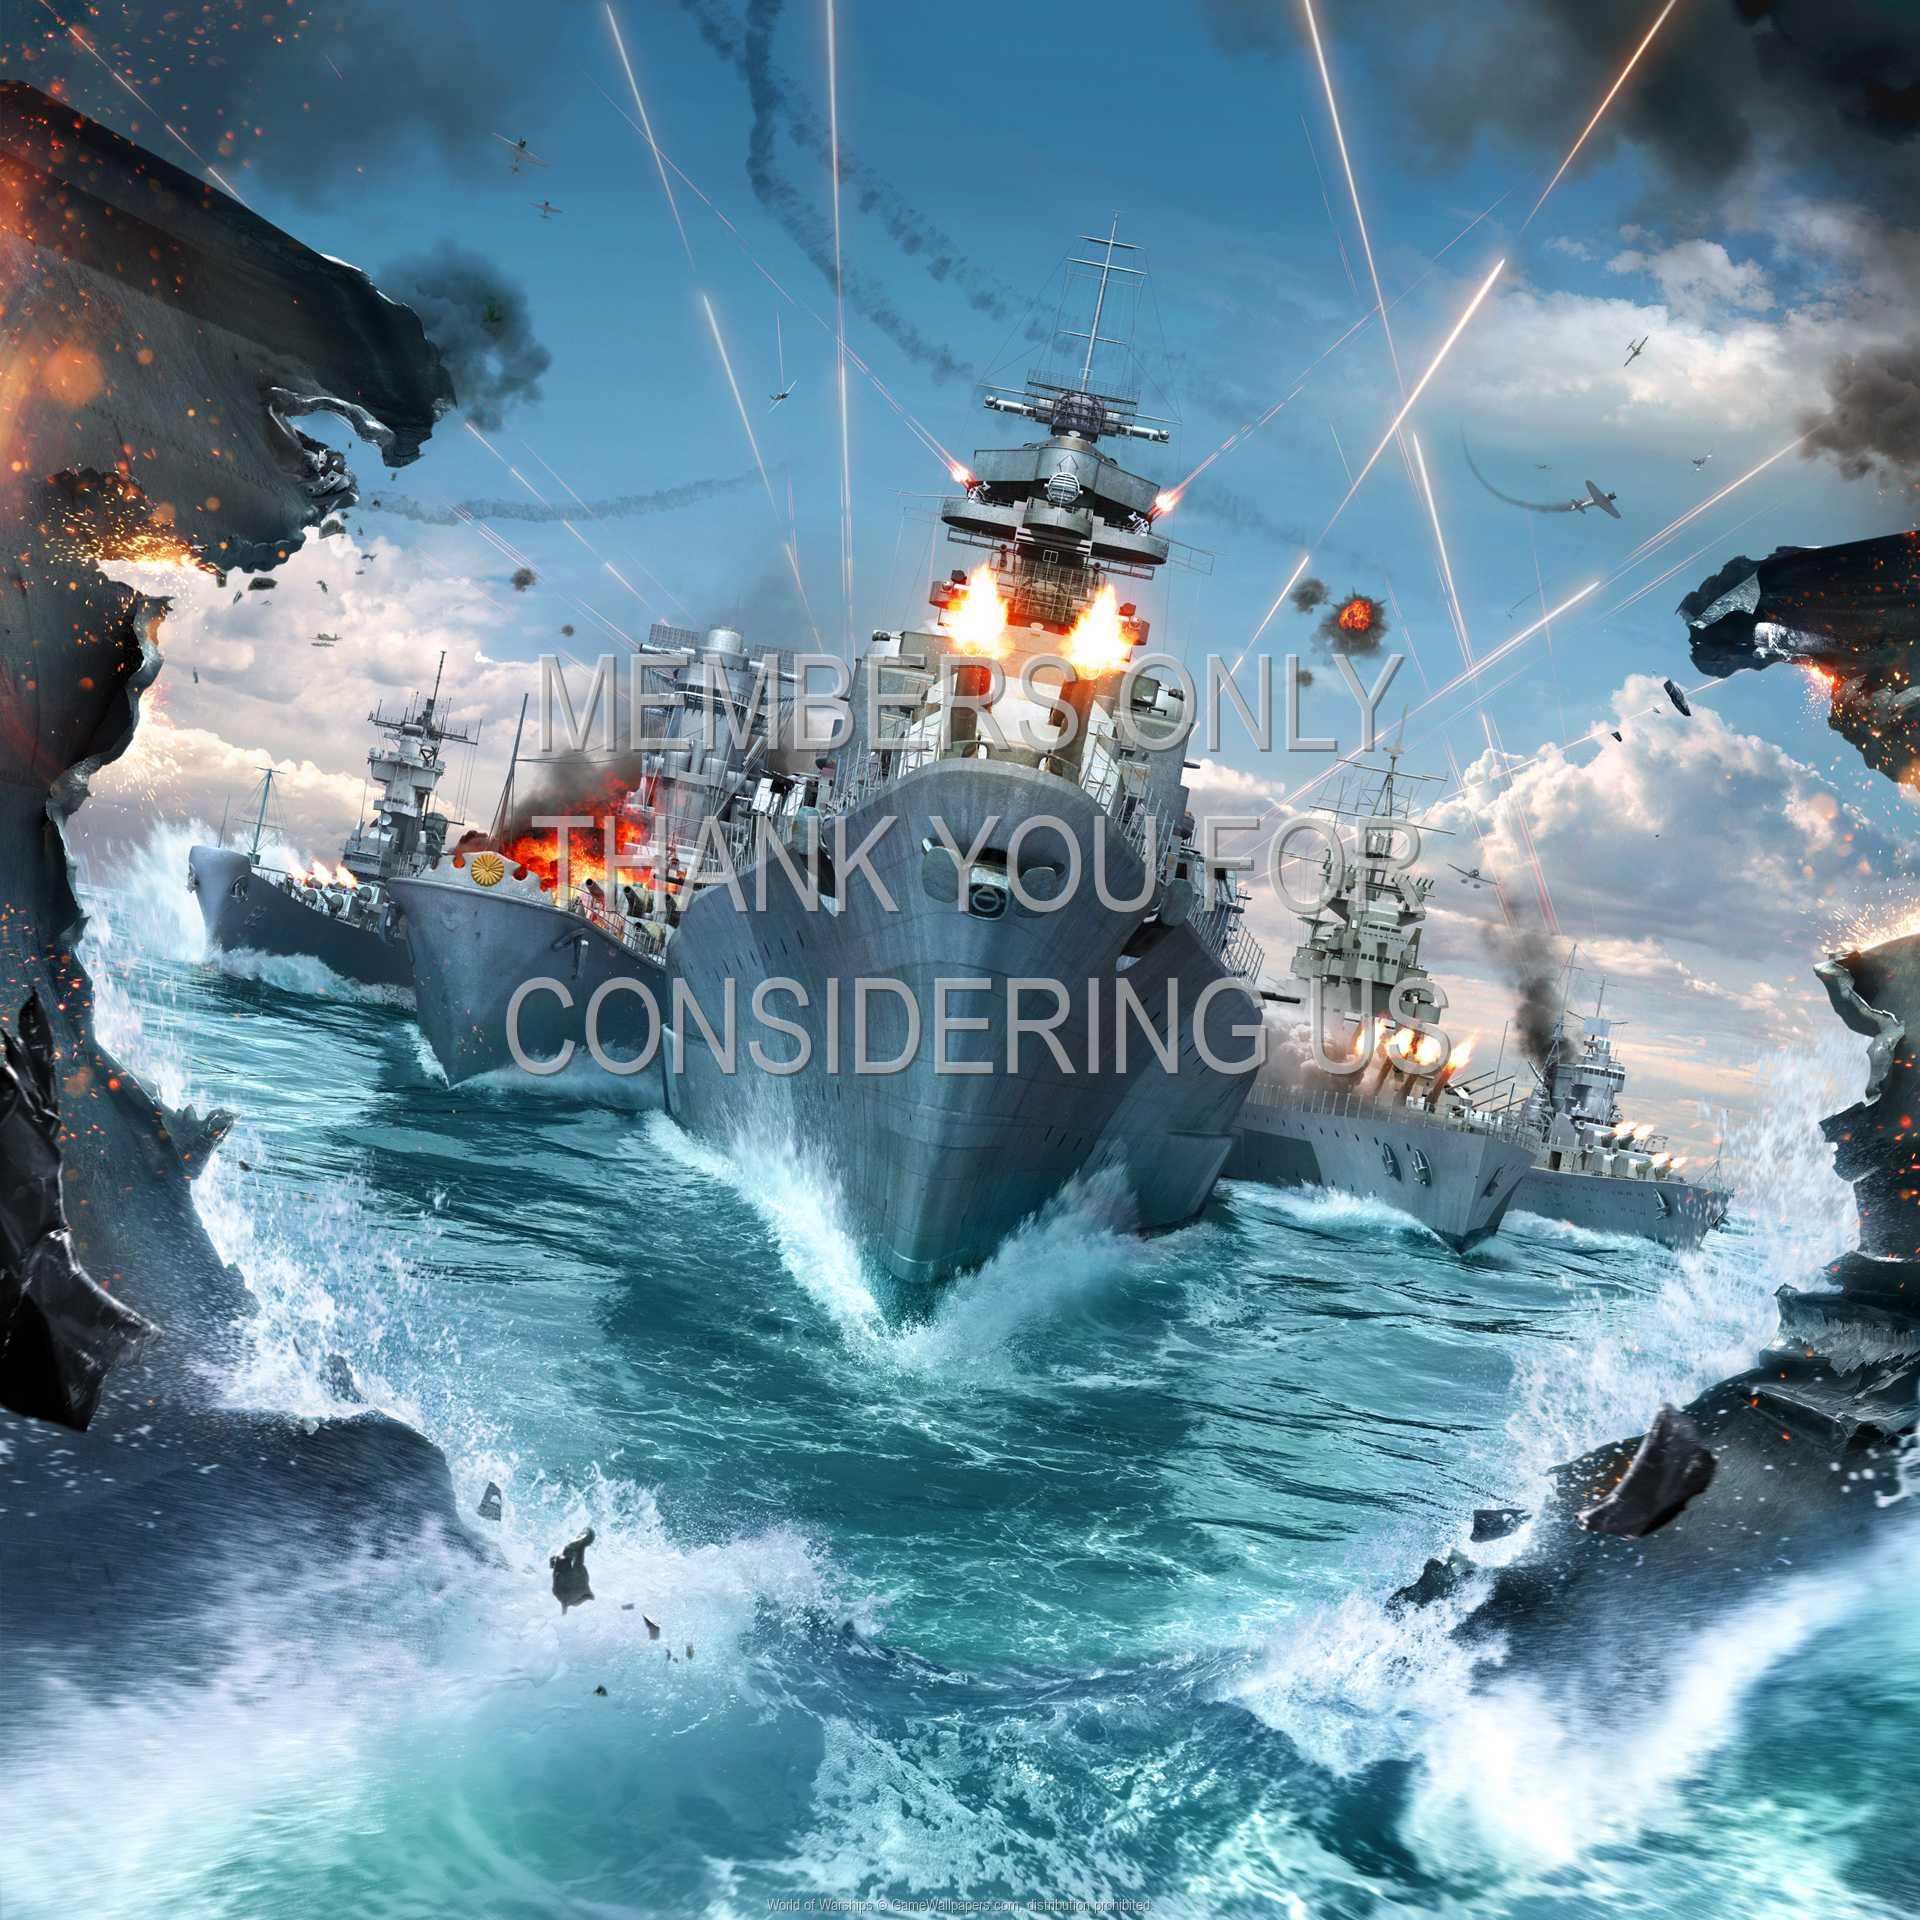 World of Warships 1080p Horizontal Mobile fond d'écran 01